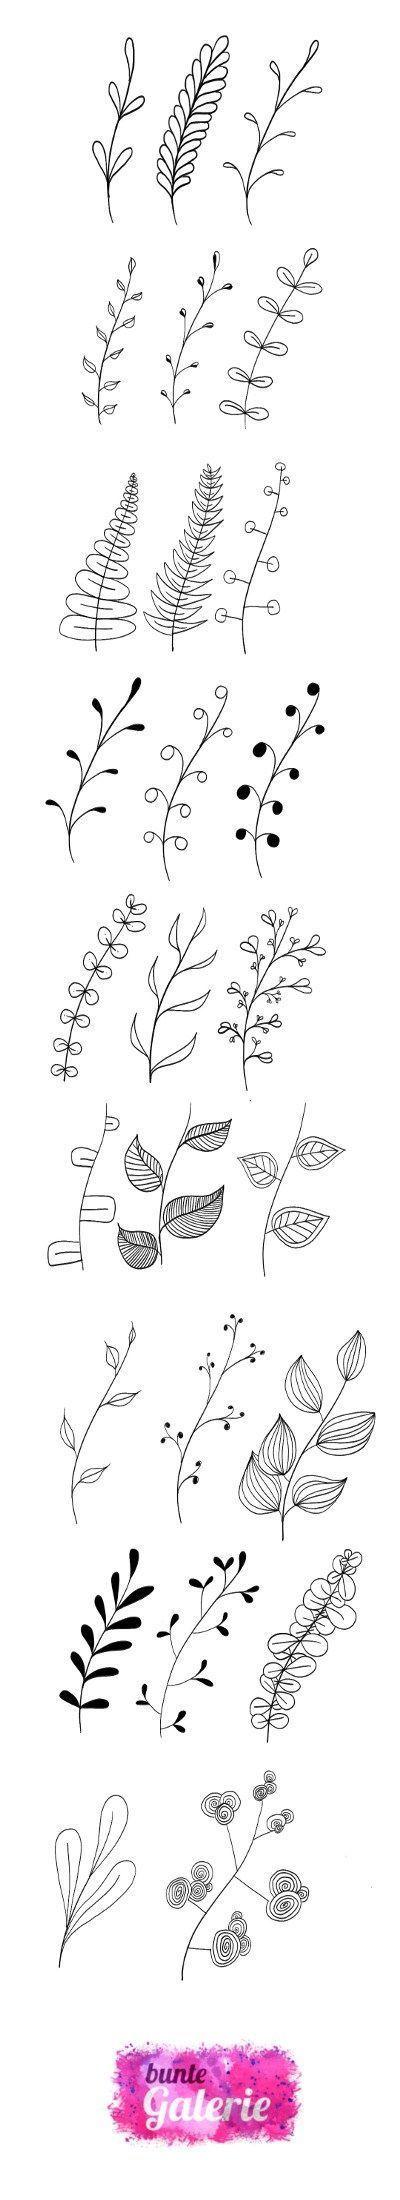 Doodle Florale Elemente für Lettering oder Zentangle inspirierte